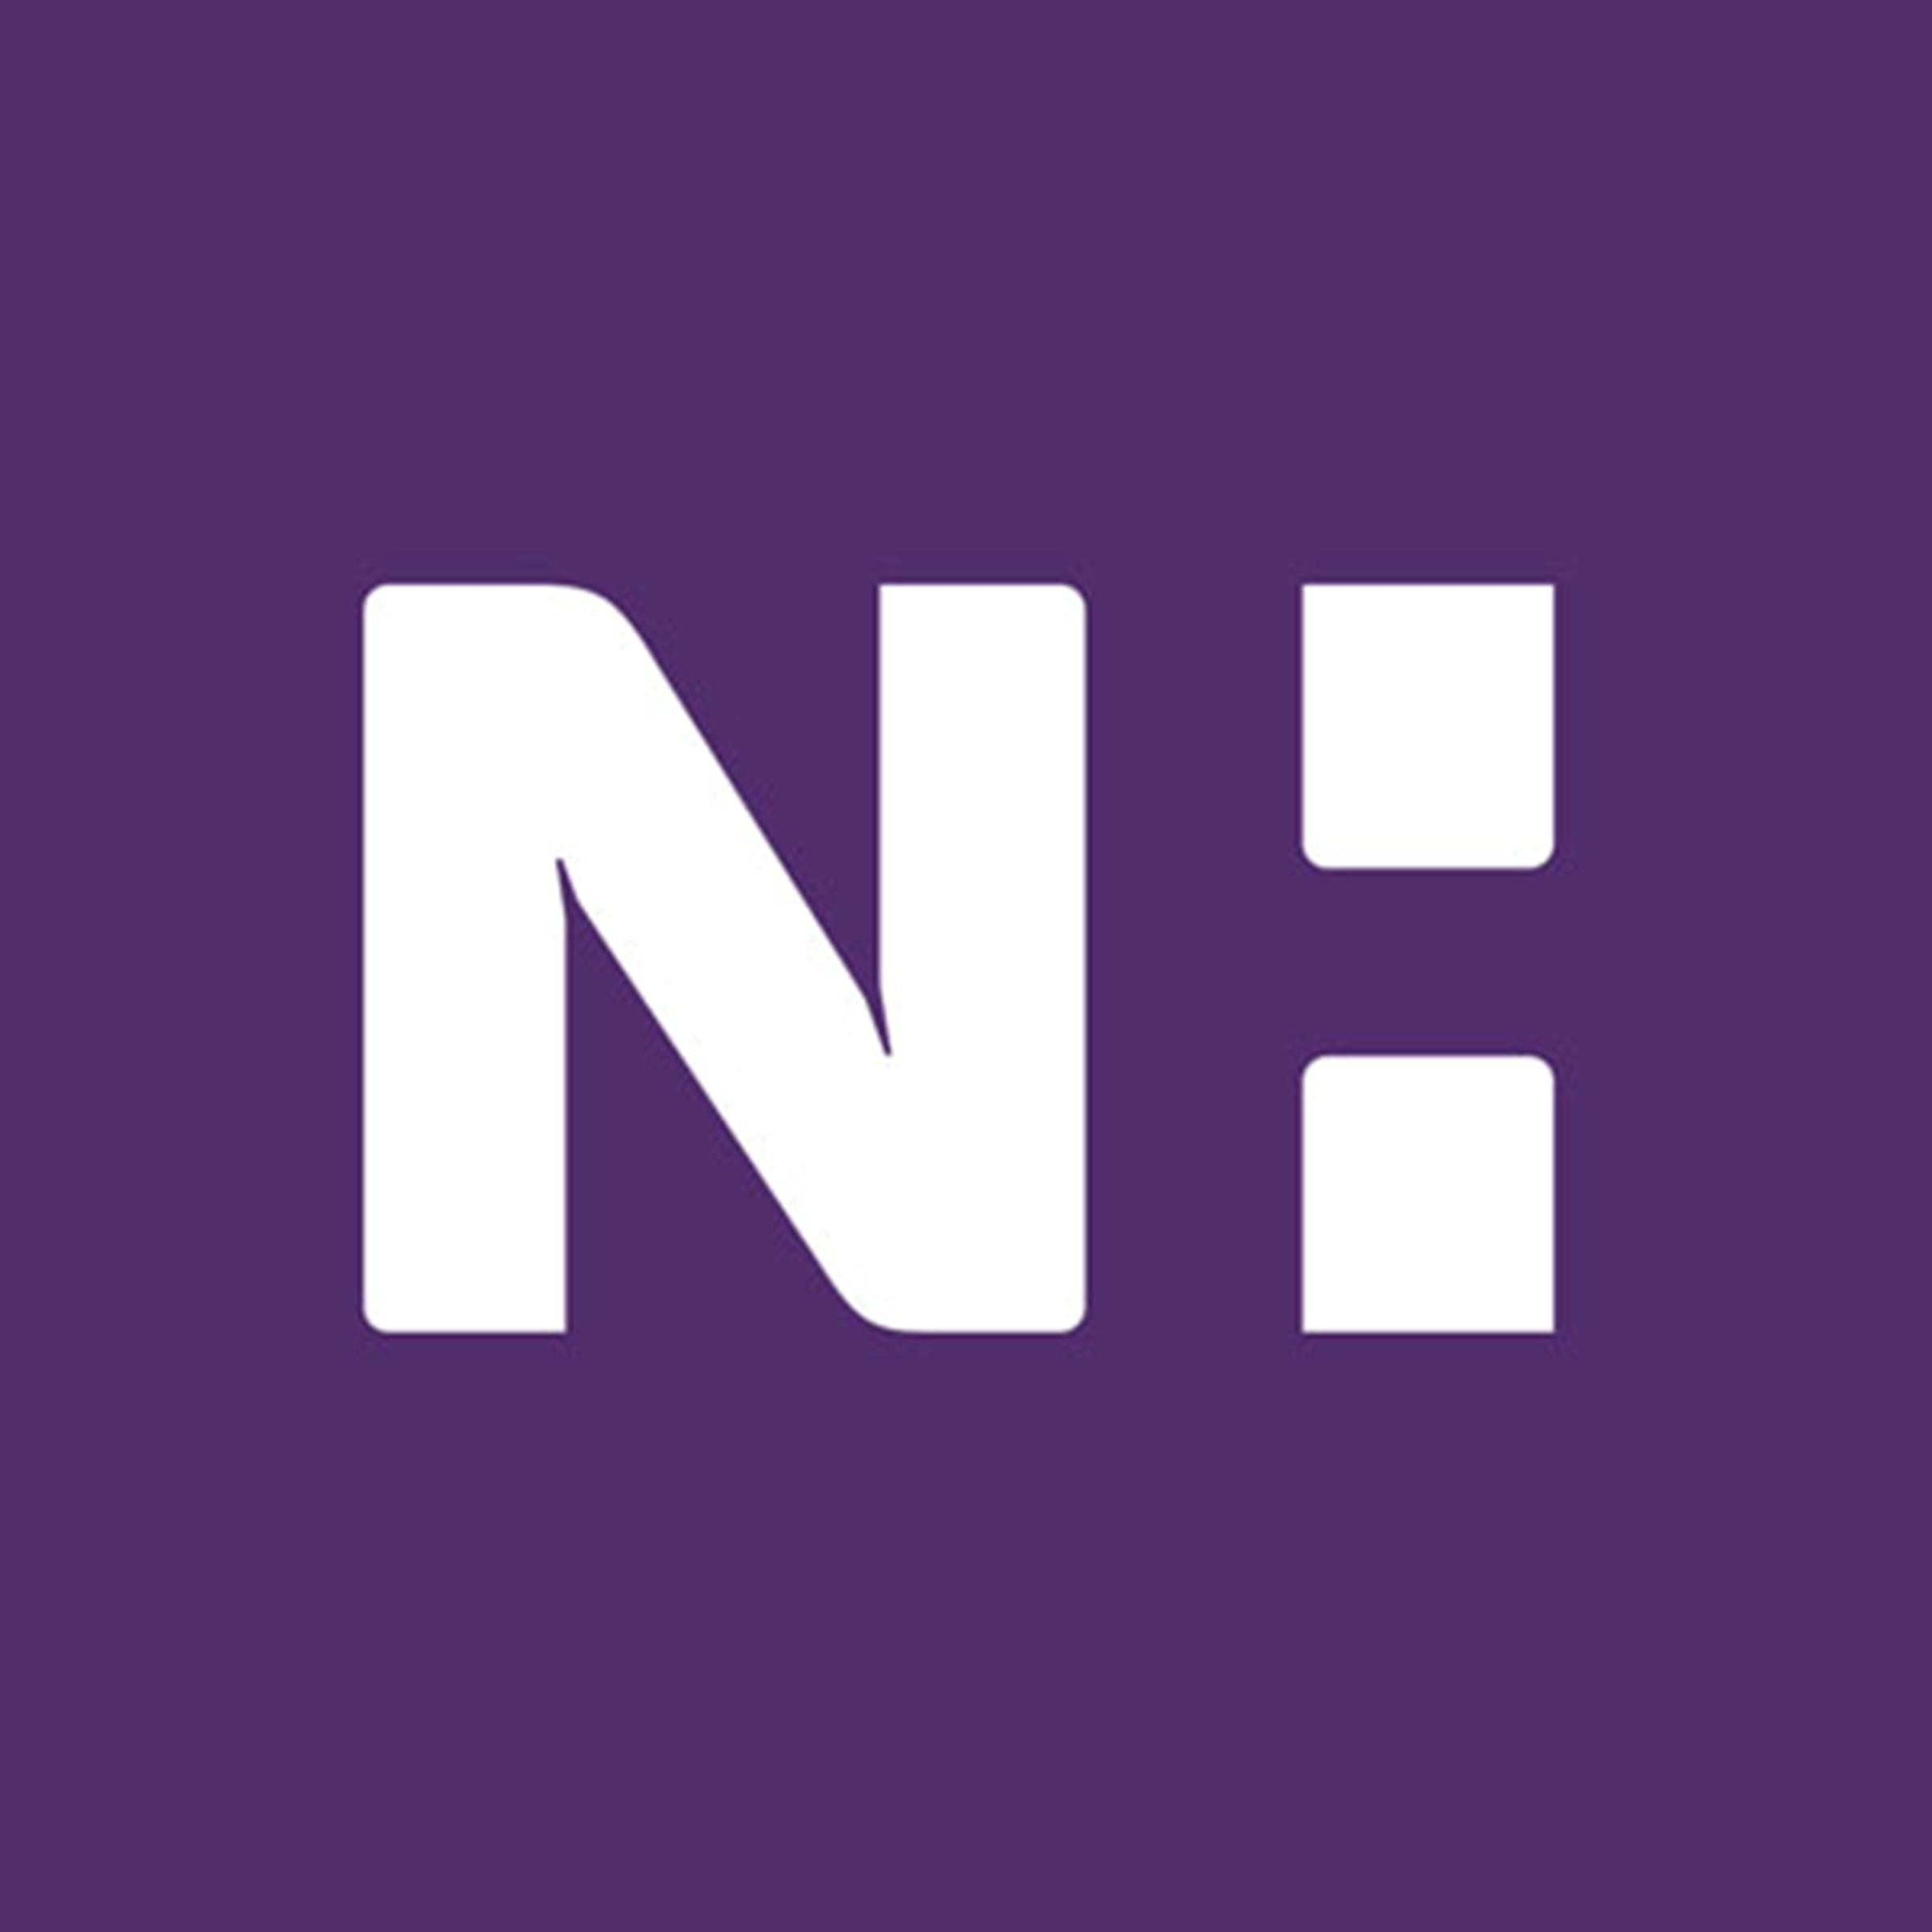 Novant Health | 2019